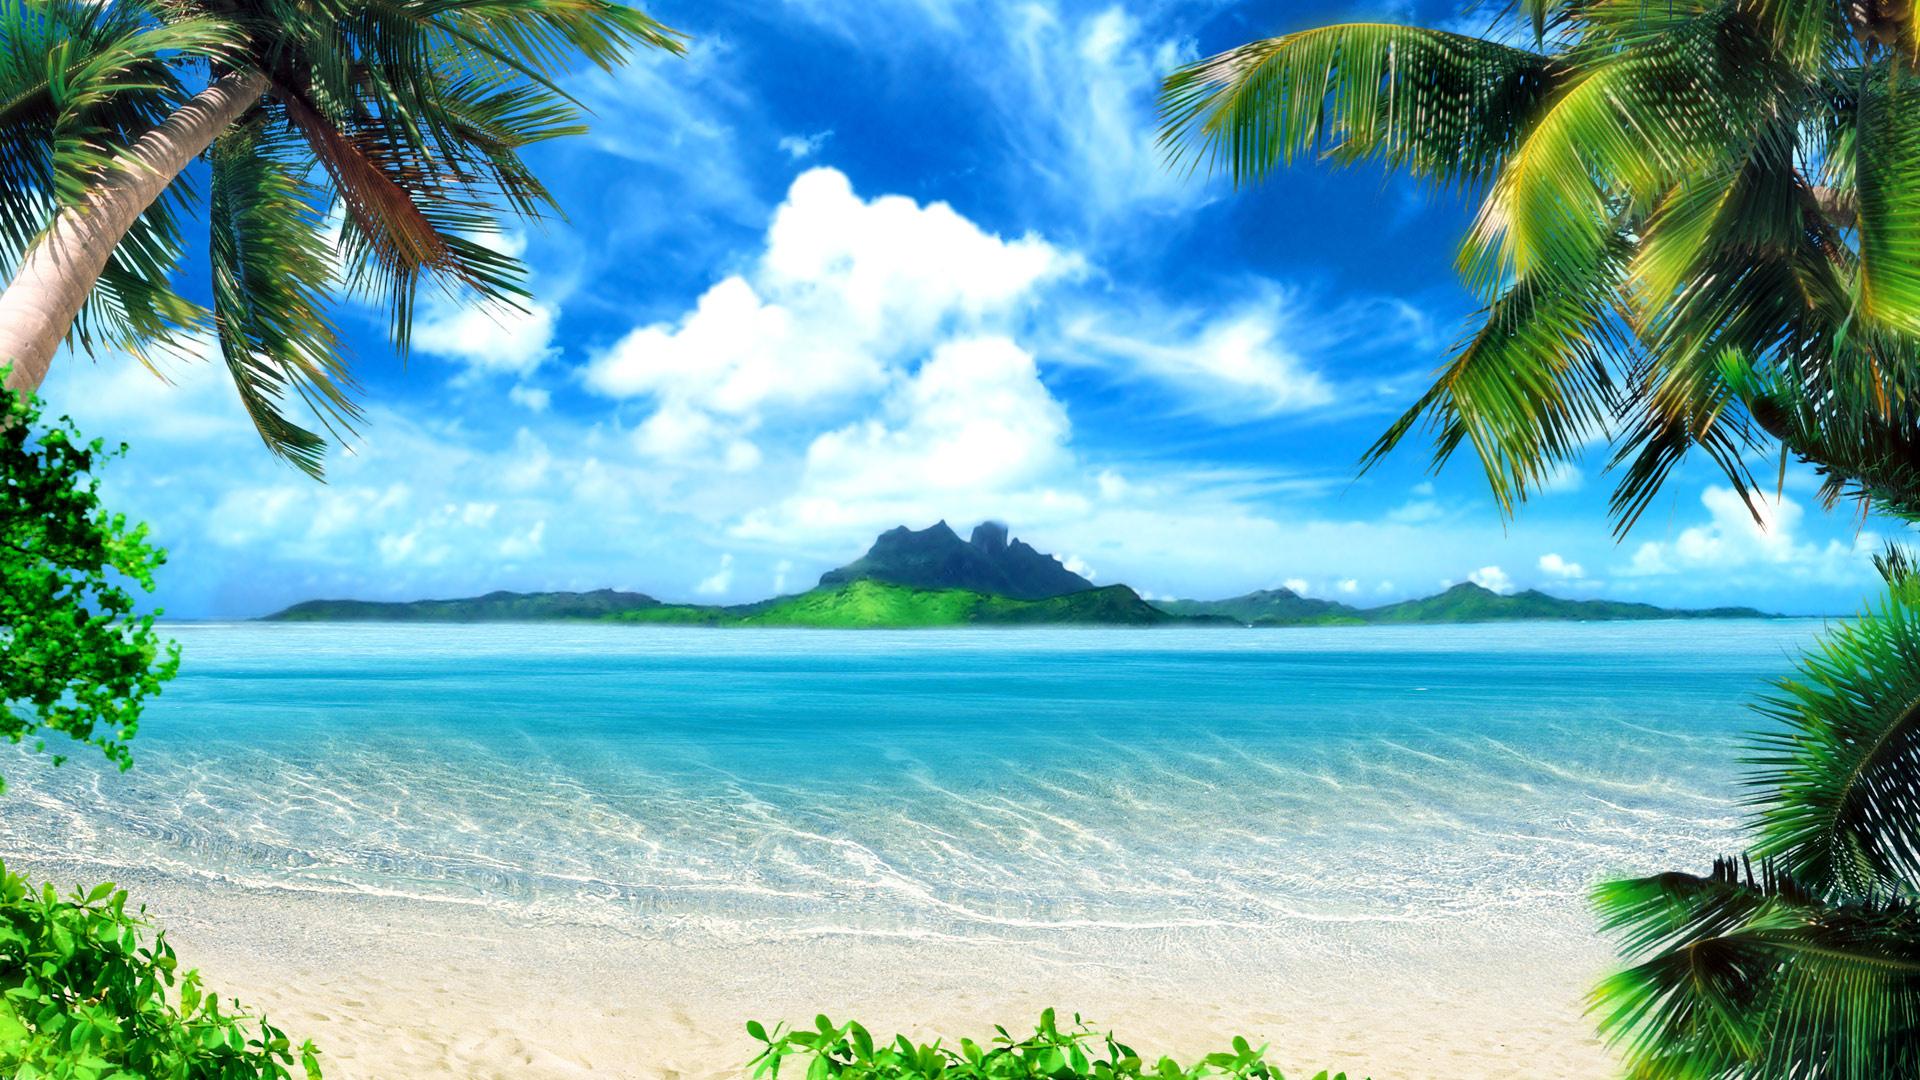 [37+] HD Wallpaper Beach Paradise on WallpaperSafari